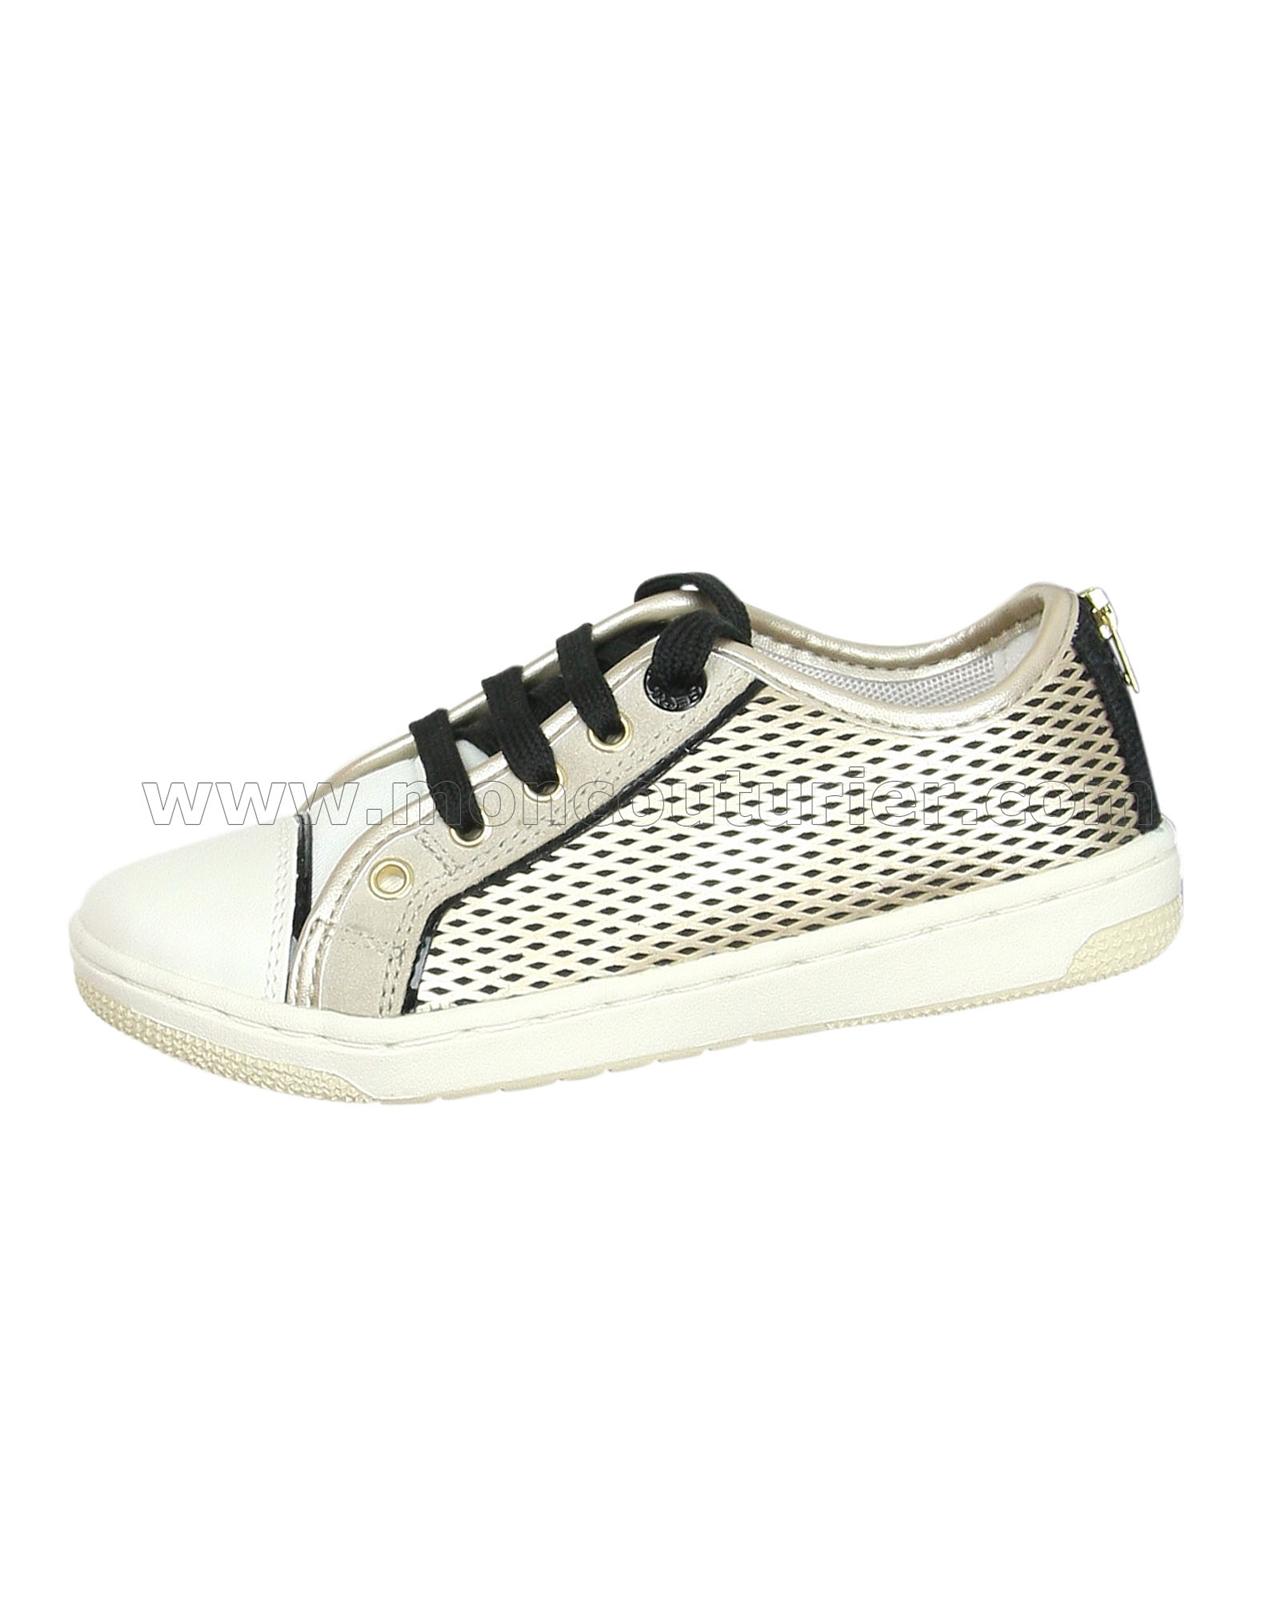 a705b510e2 GEOX Girls' Sneakers Jr Creamy Gold